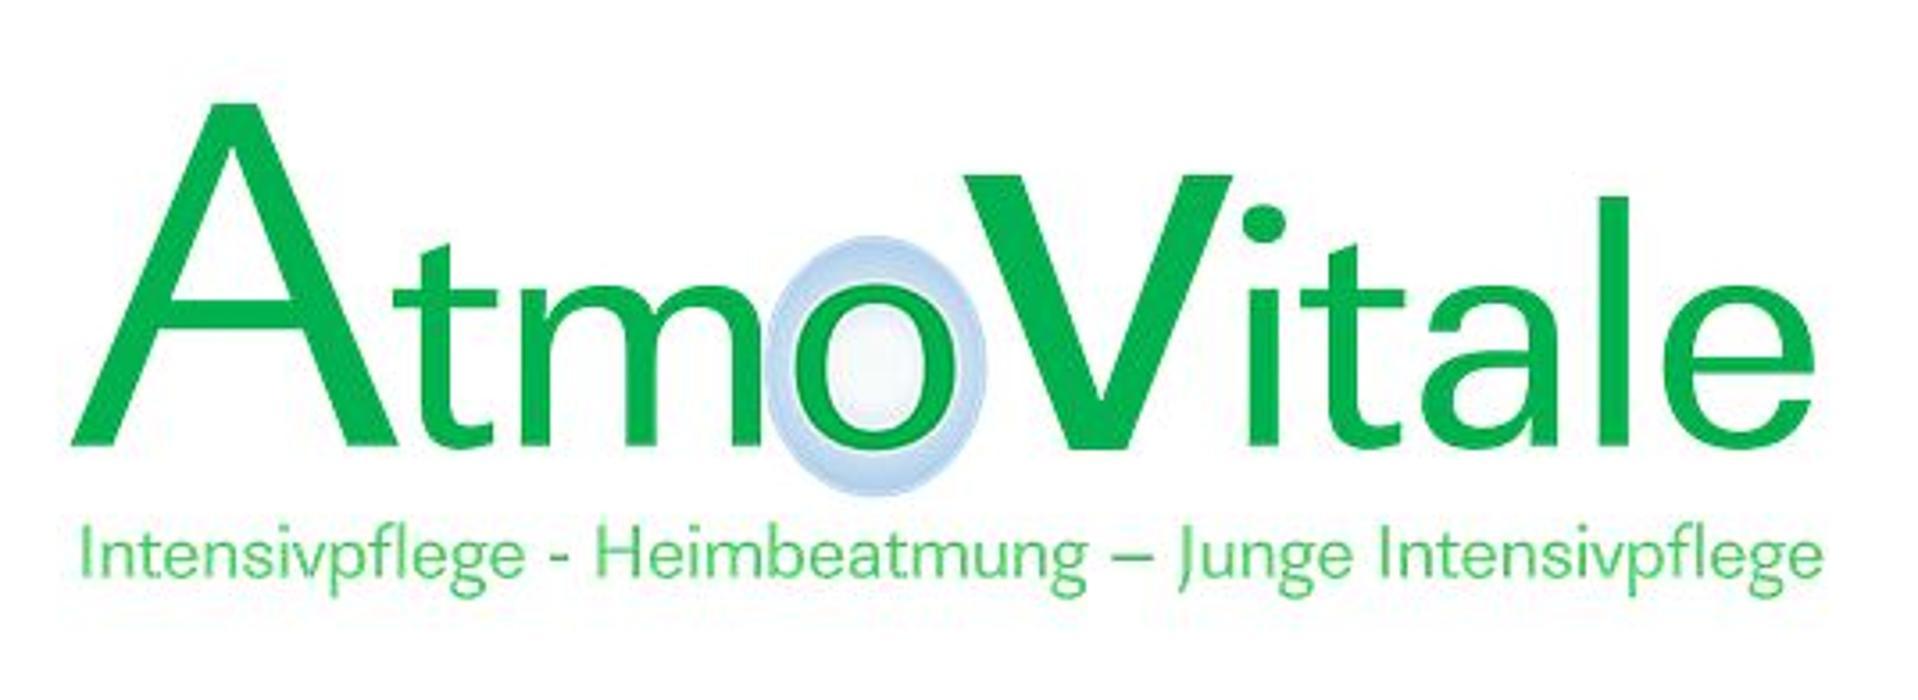 Bild zu AtmoVitale GmbH - Intensivpflege - Heimbeatmung in Dortmund